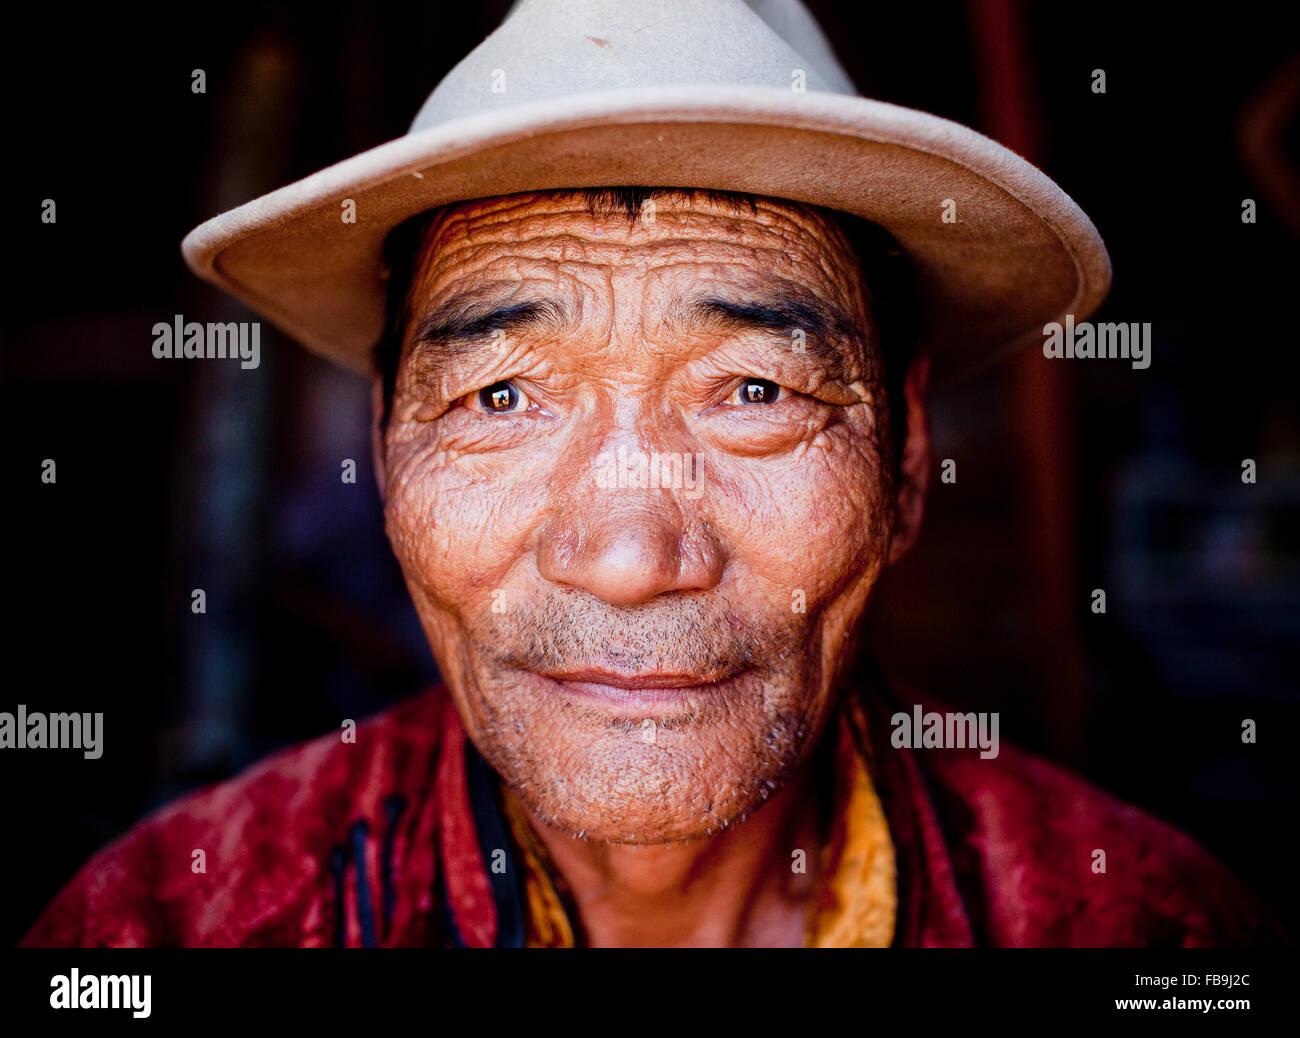 A lifetime spent under the eternal blue sky encapsulated in the face of a nomad elder in Mongolia's Gobi Desert. - Stock Image